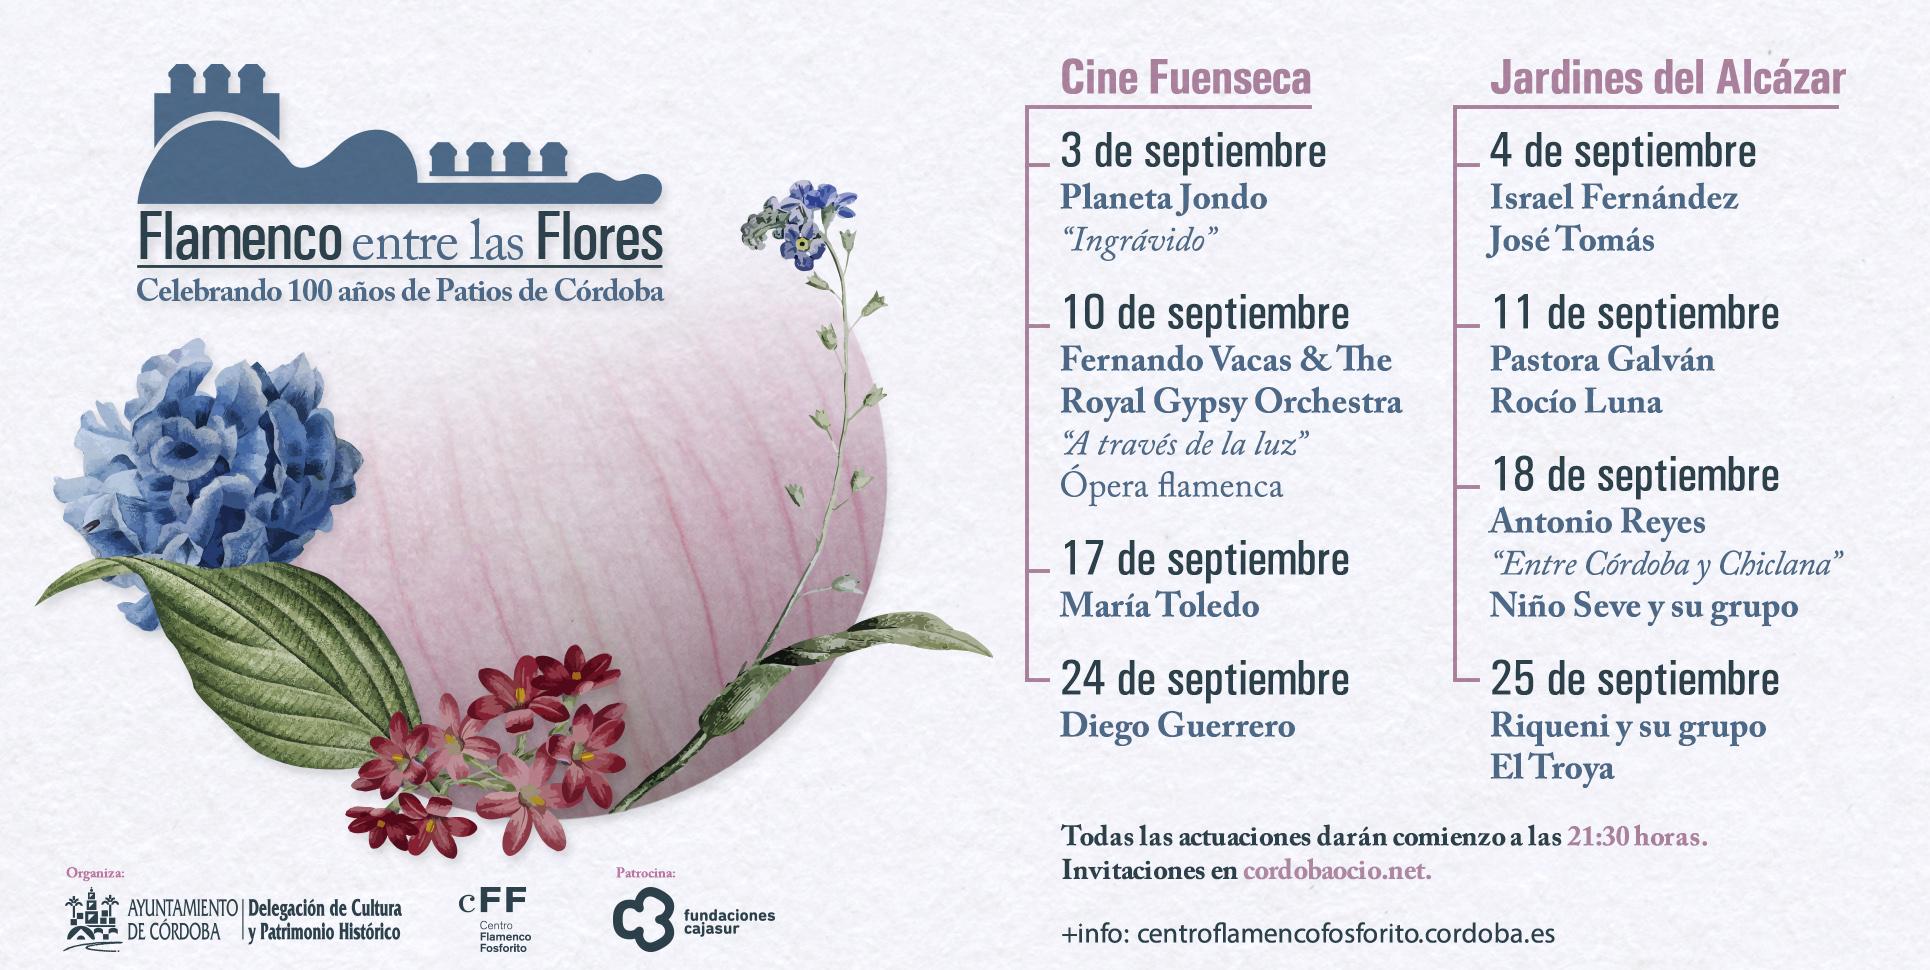 Flamenco entre las flores @ Cine Fuenseca / Jardines Alcázar | Córdoba | Andalucía | España